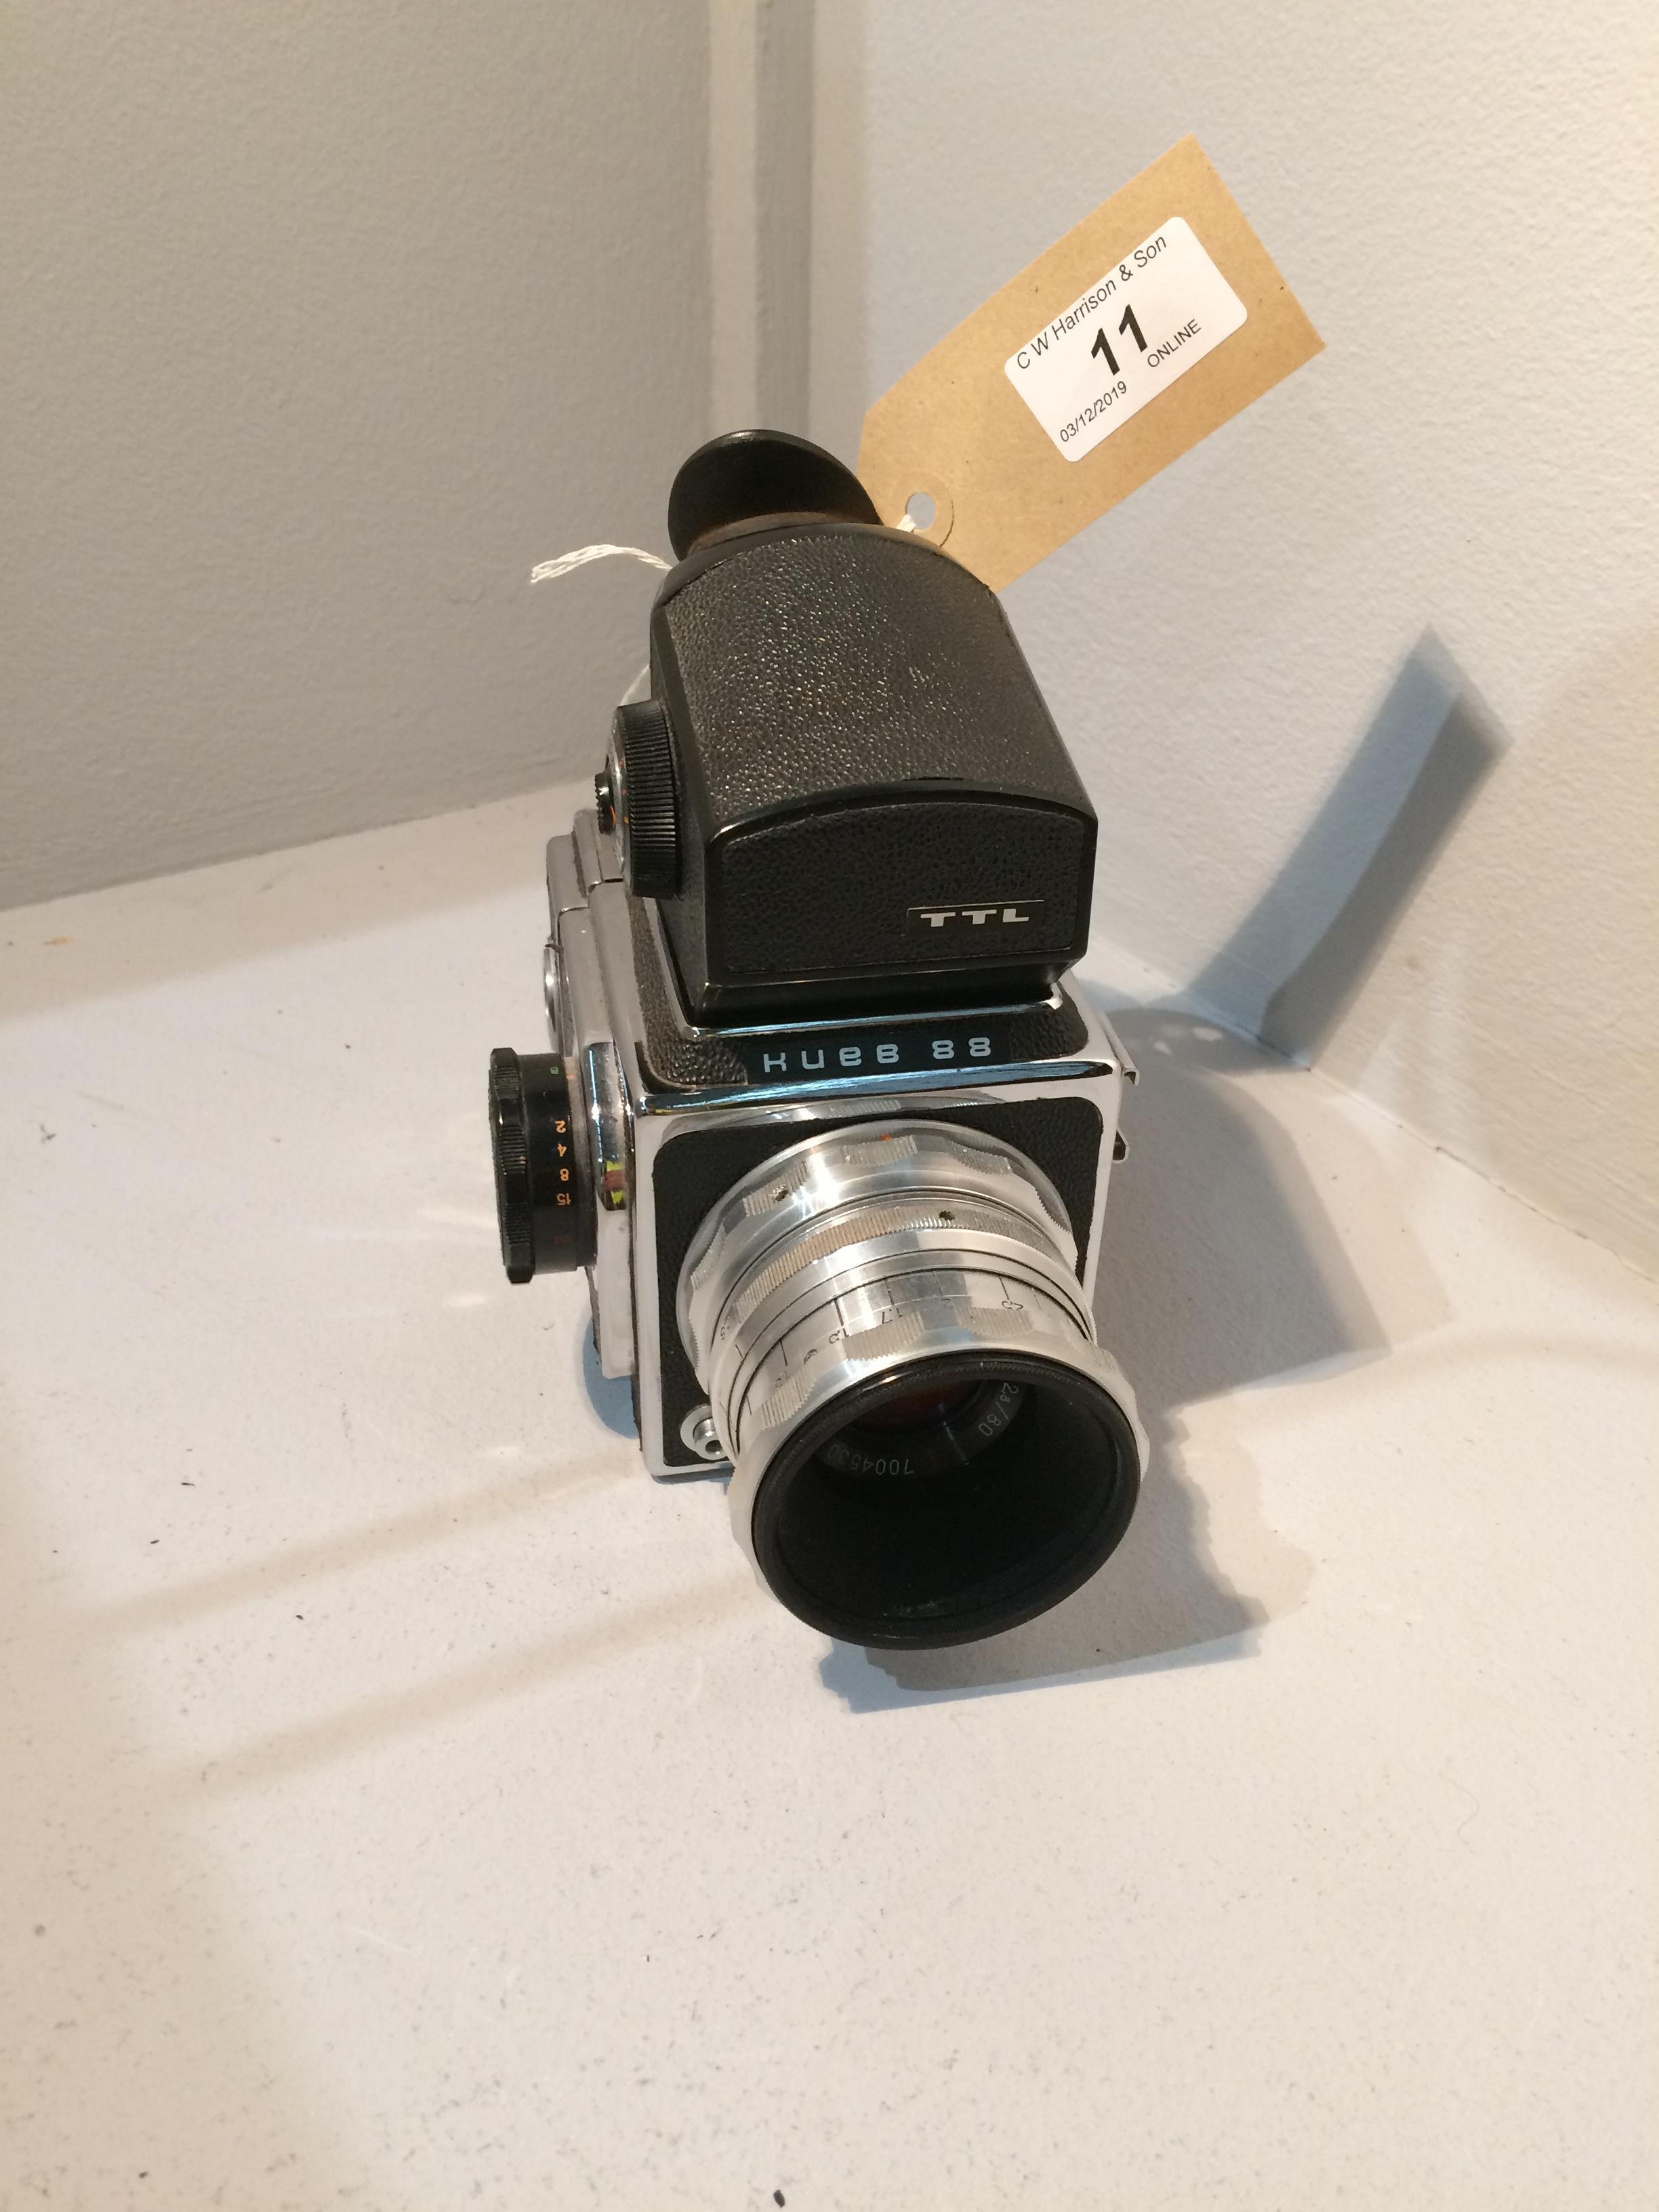 Lot 11 - Kueb 88 TTL movie camera